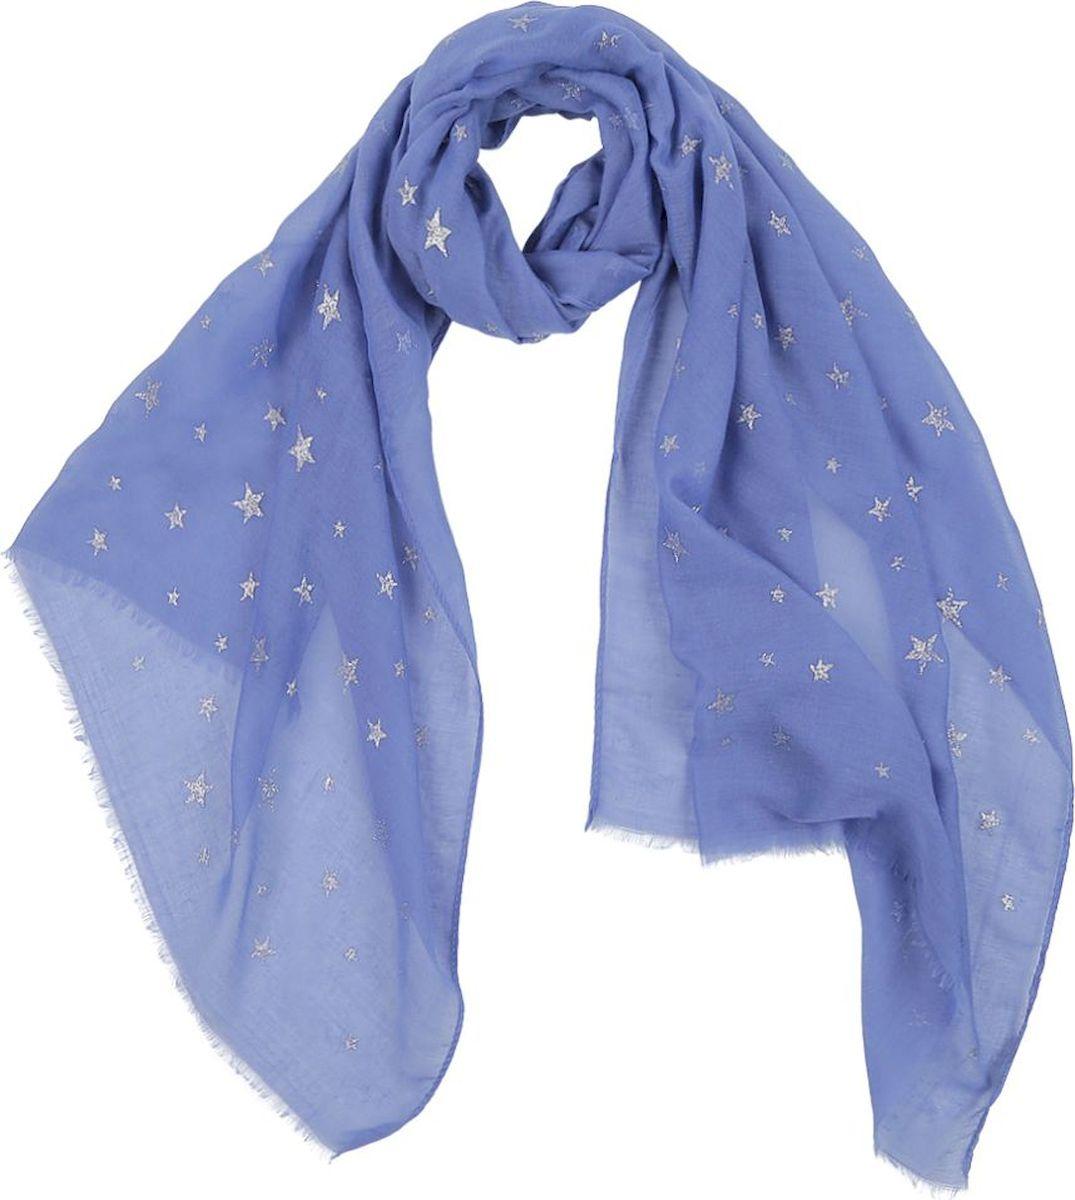 Шарф женский Fabretti, цвет: голубой. KY0559E. Размер 180 см х 70 см шарф женский sophie ramage цвет синий розовый зеленый yy 21402 3 размер 60 см х 180 см